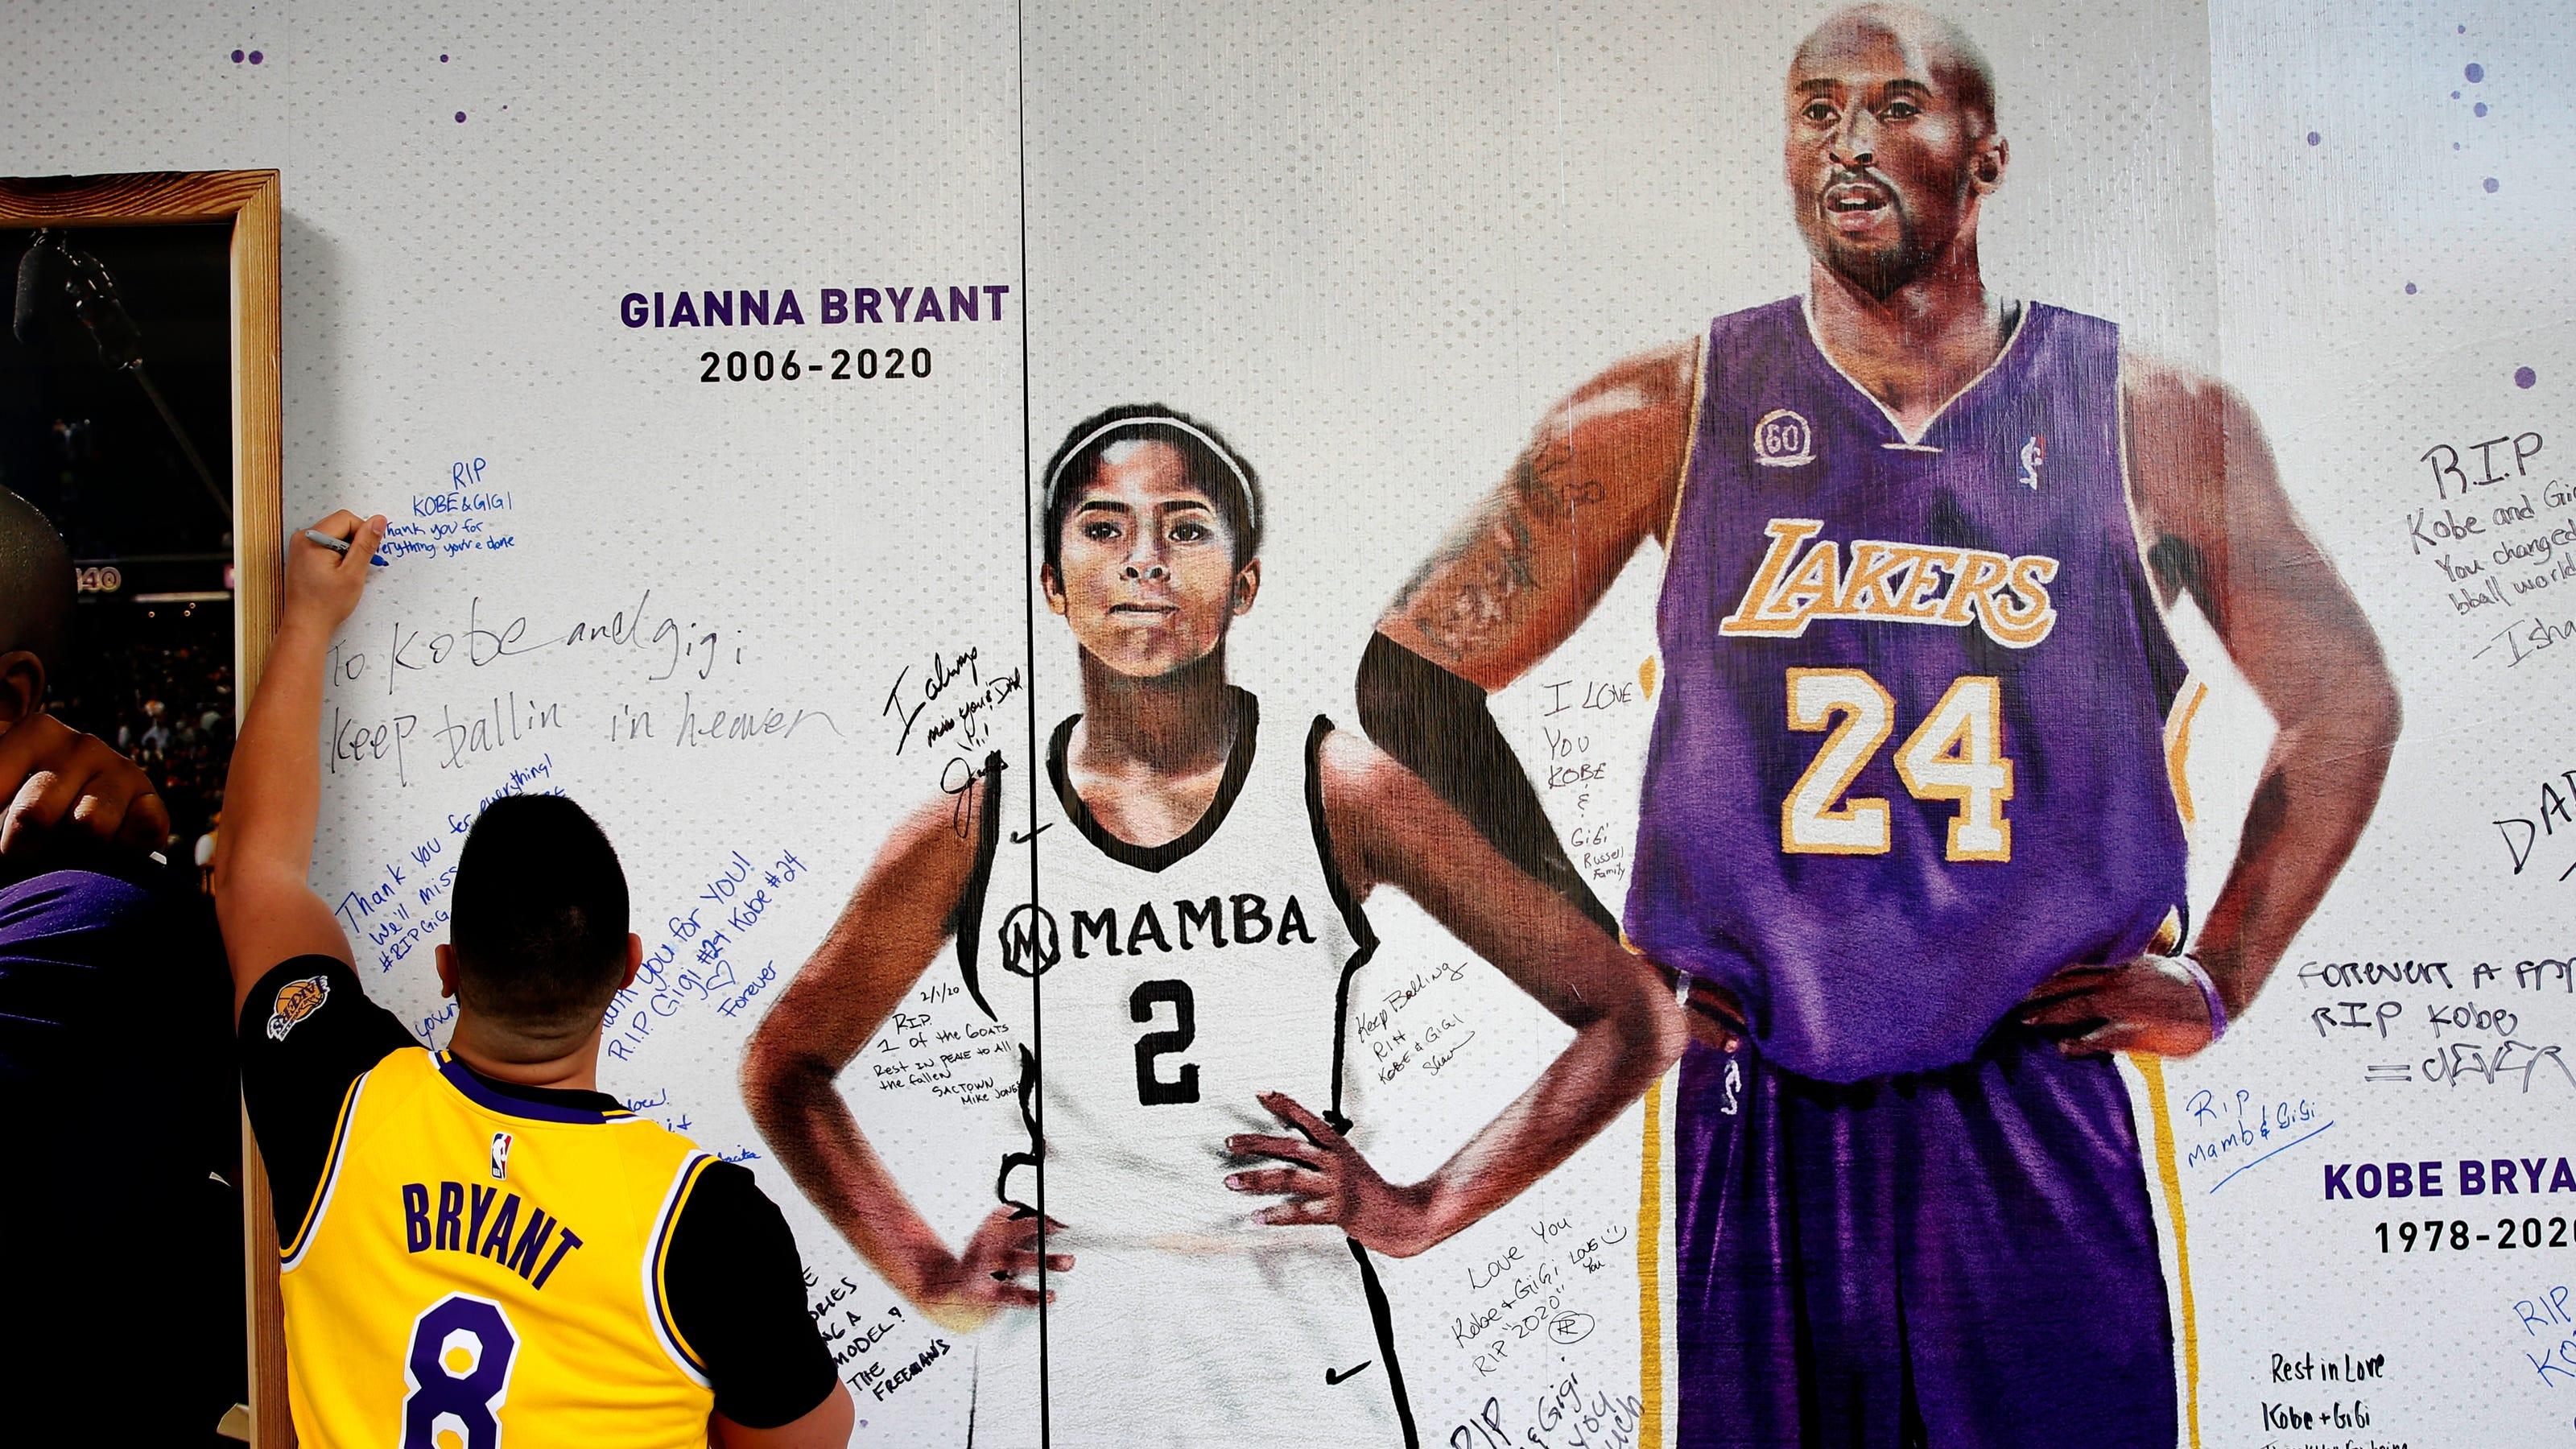 Gianna Bryant's school retires her No. 2 basketball jersey